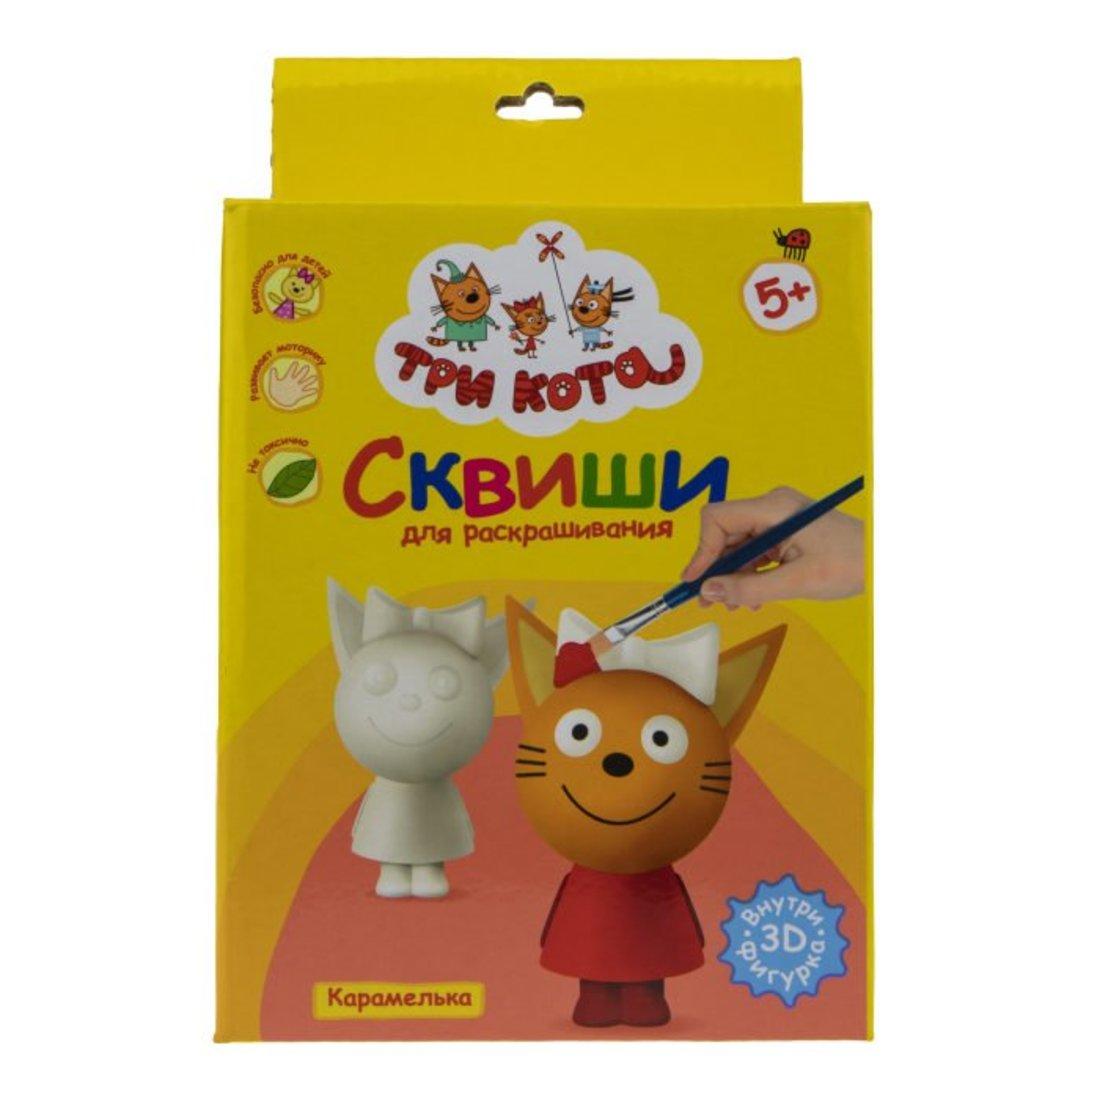 Набор для раскрашивания сквиши Три кота, Карамелька